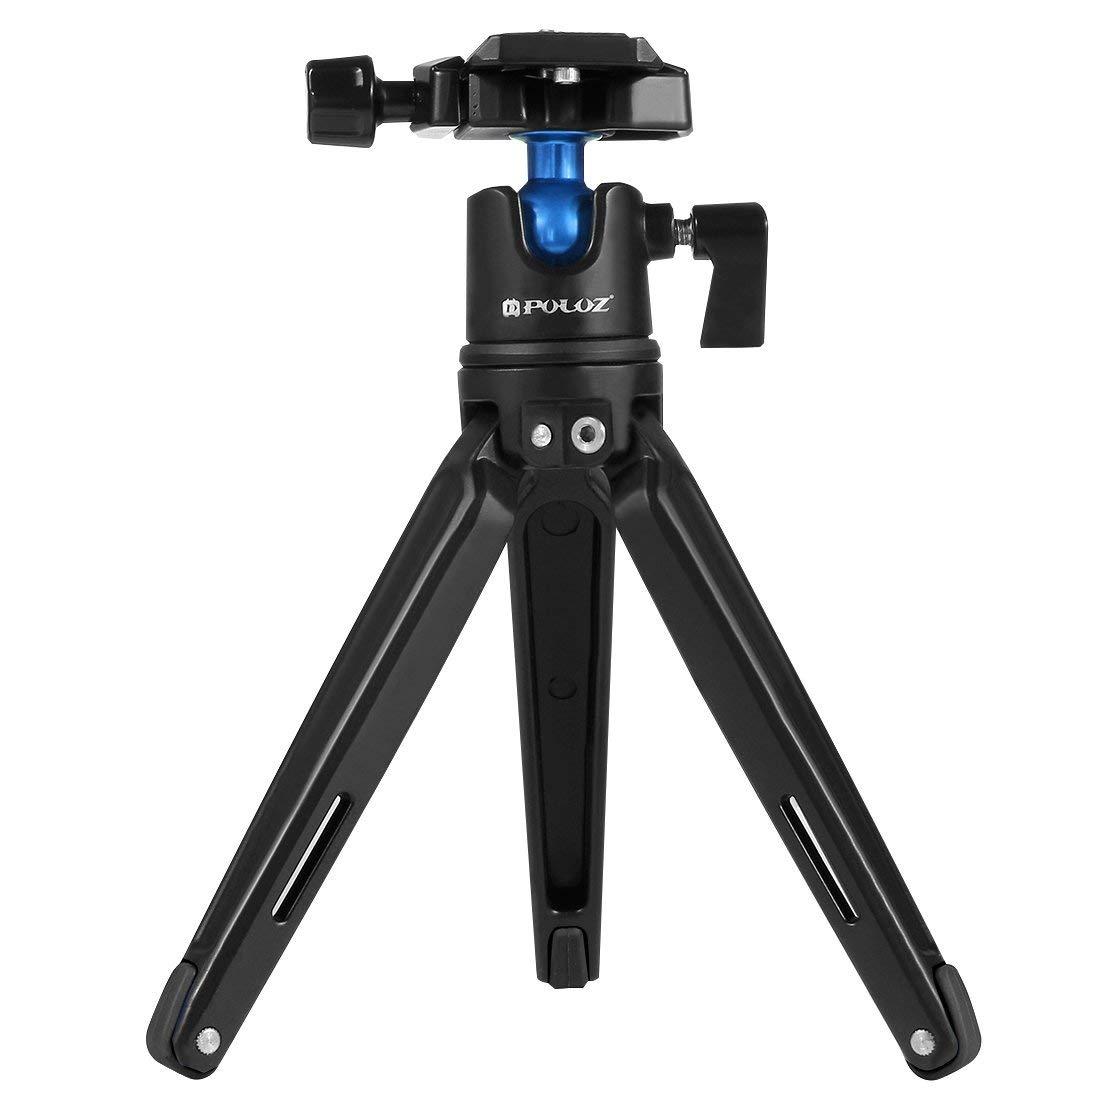 HITSAN PULUZ PU3002 Pocket Mini Metal Tripod 360 Degree Ball Head Holder Stand Mount for DSLR Camera One Piece